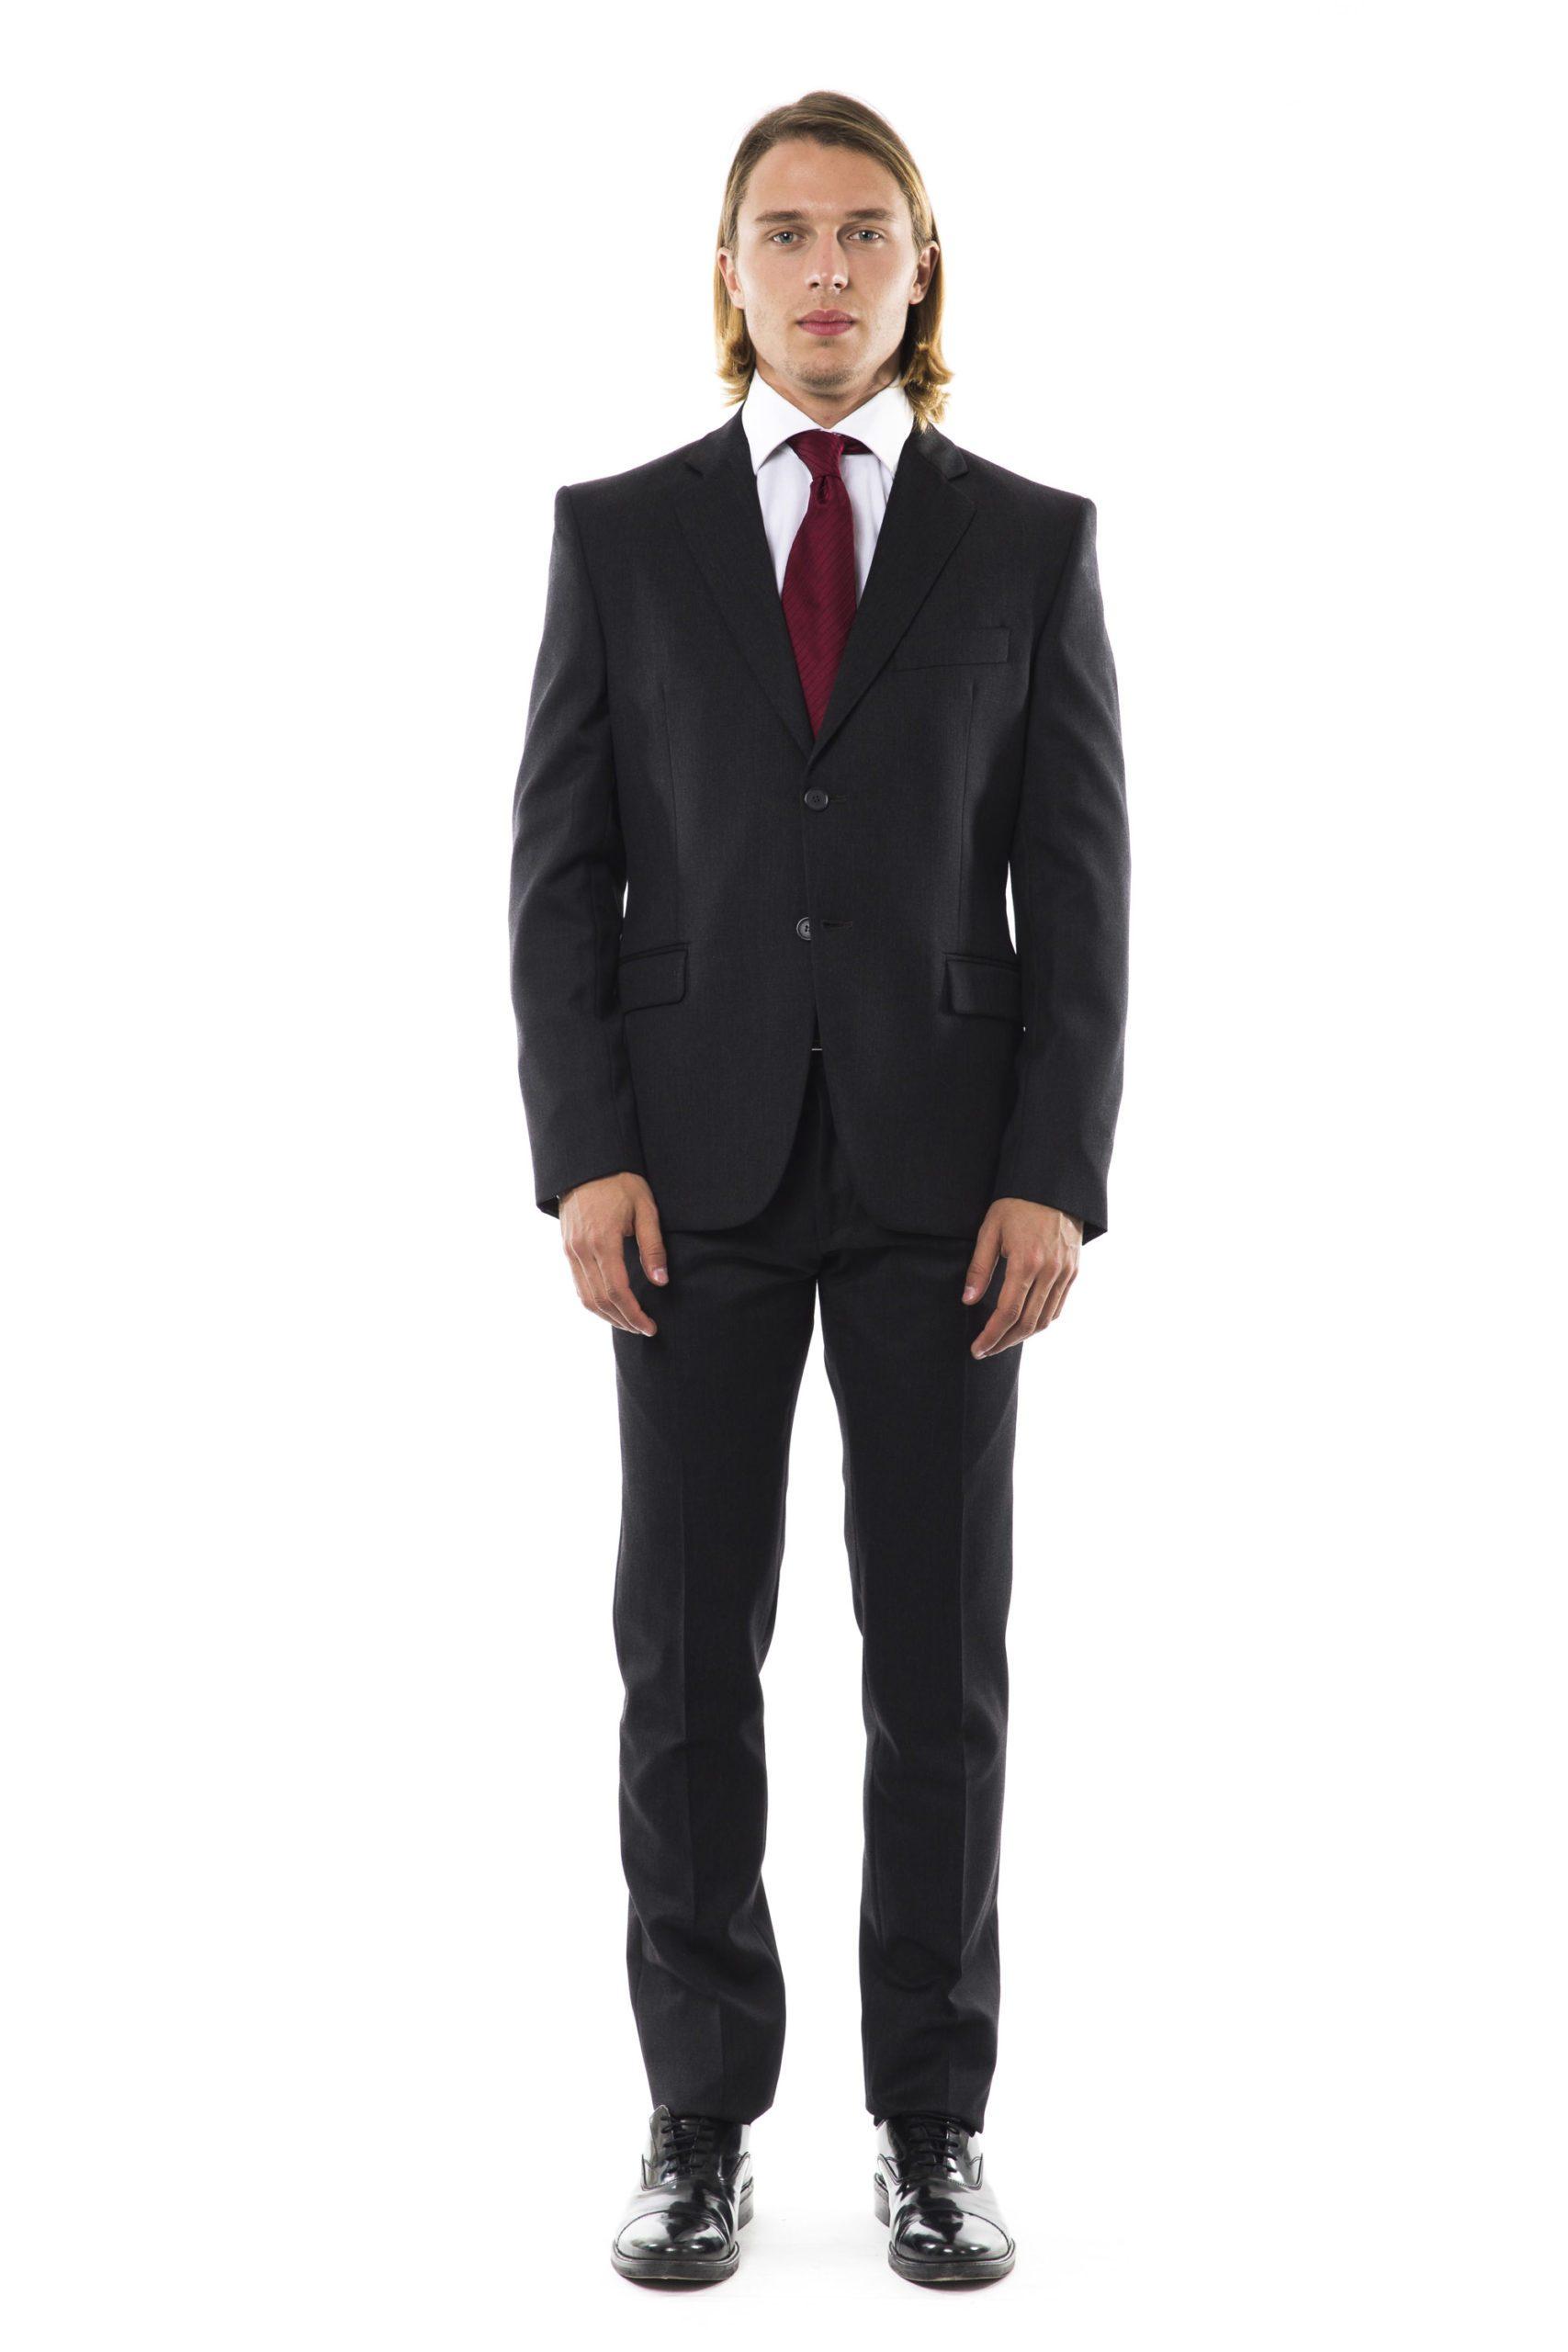 Uominitaliani Men's U- G R I G I O Suit Gray UO997026 - IT50 | L